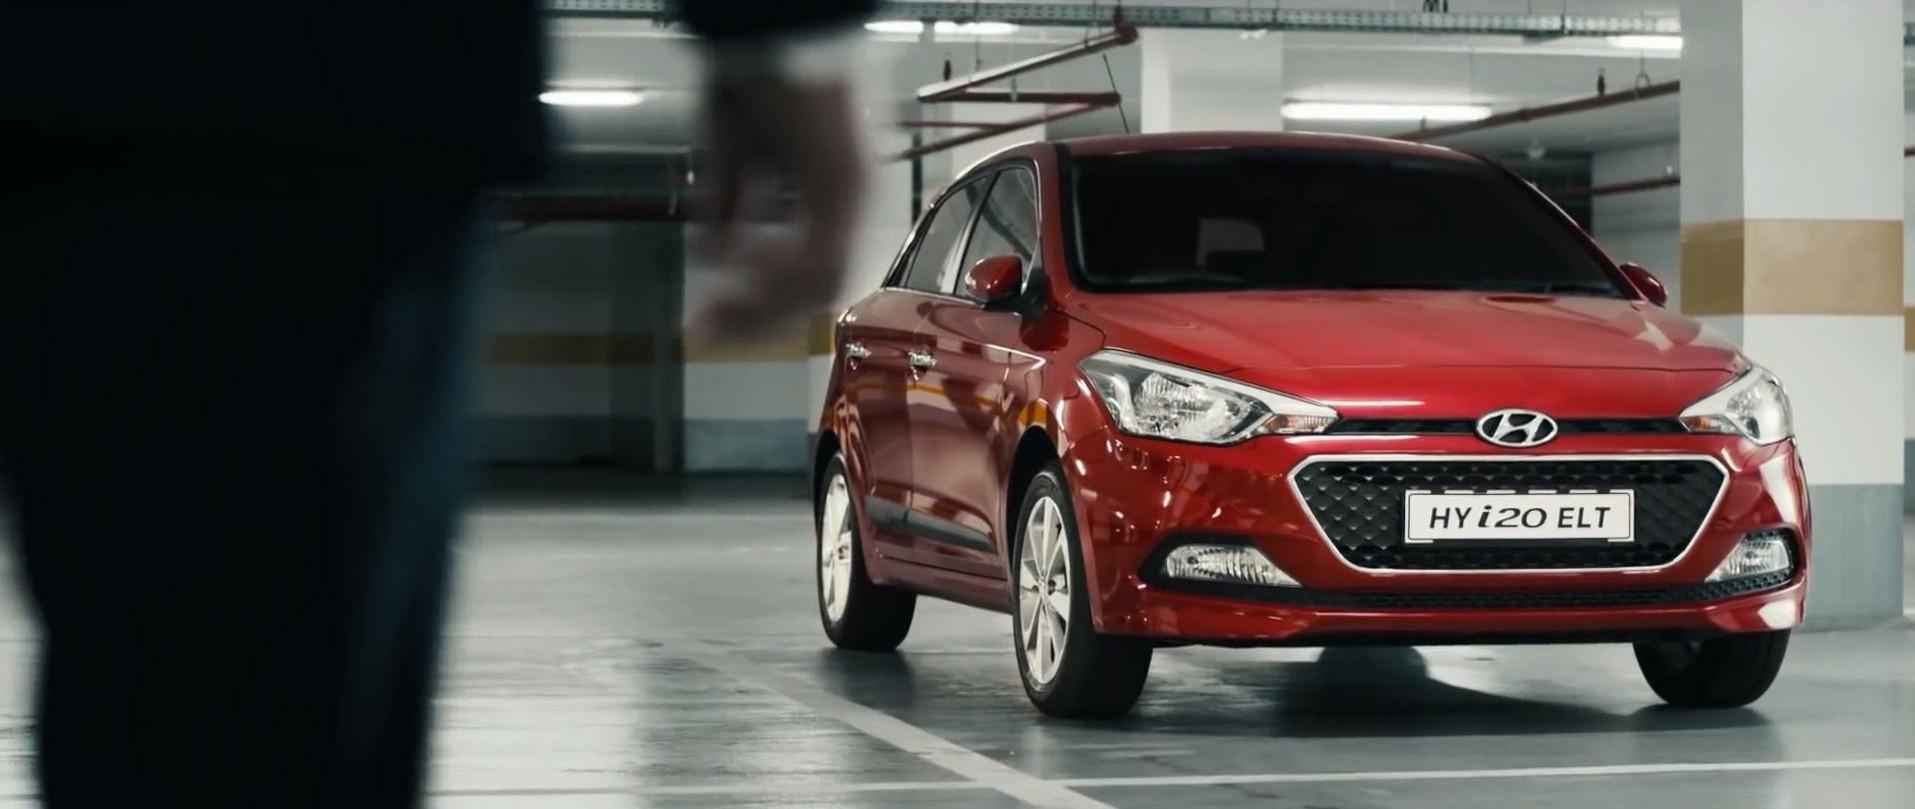 Hyundai India Elite i20 commerical red parking garange